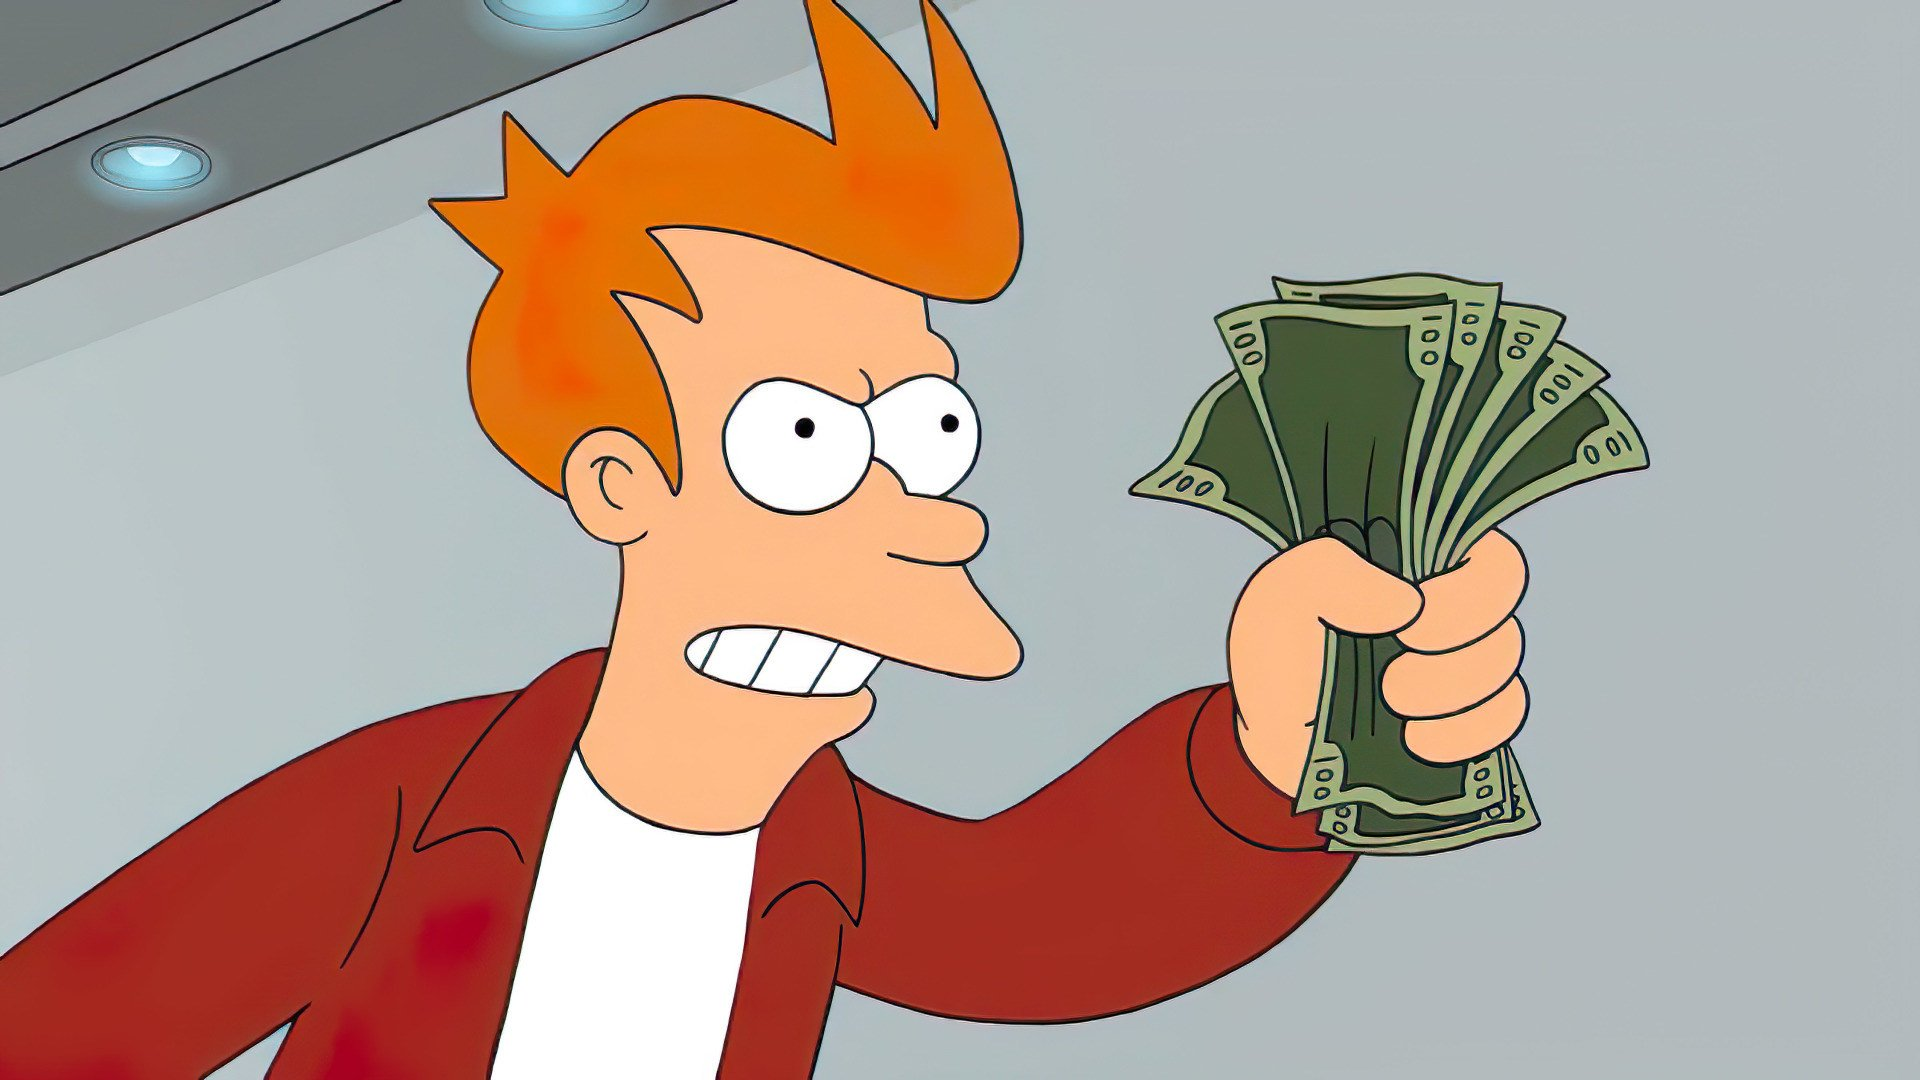 Geld, Paypal, Bezahlen, Meme, Kreditkarten, Bargeld, girocard, EC-Karte, Zahlungsmittel